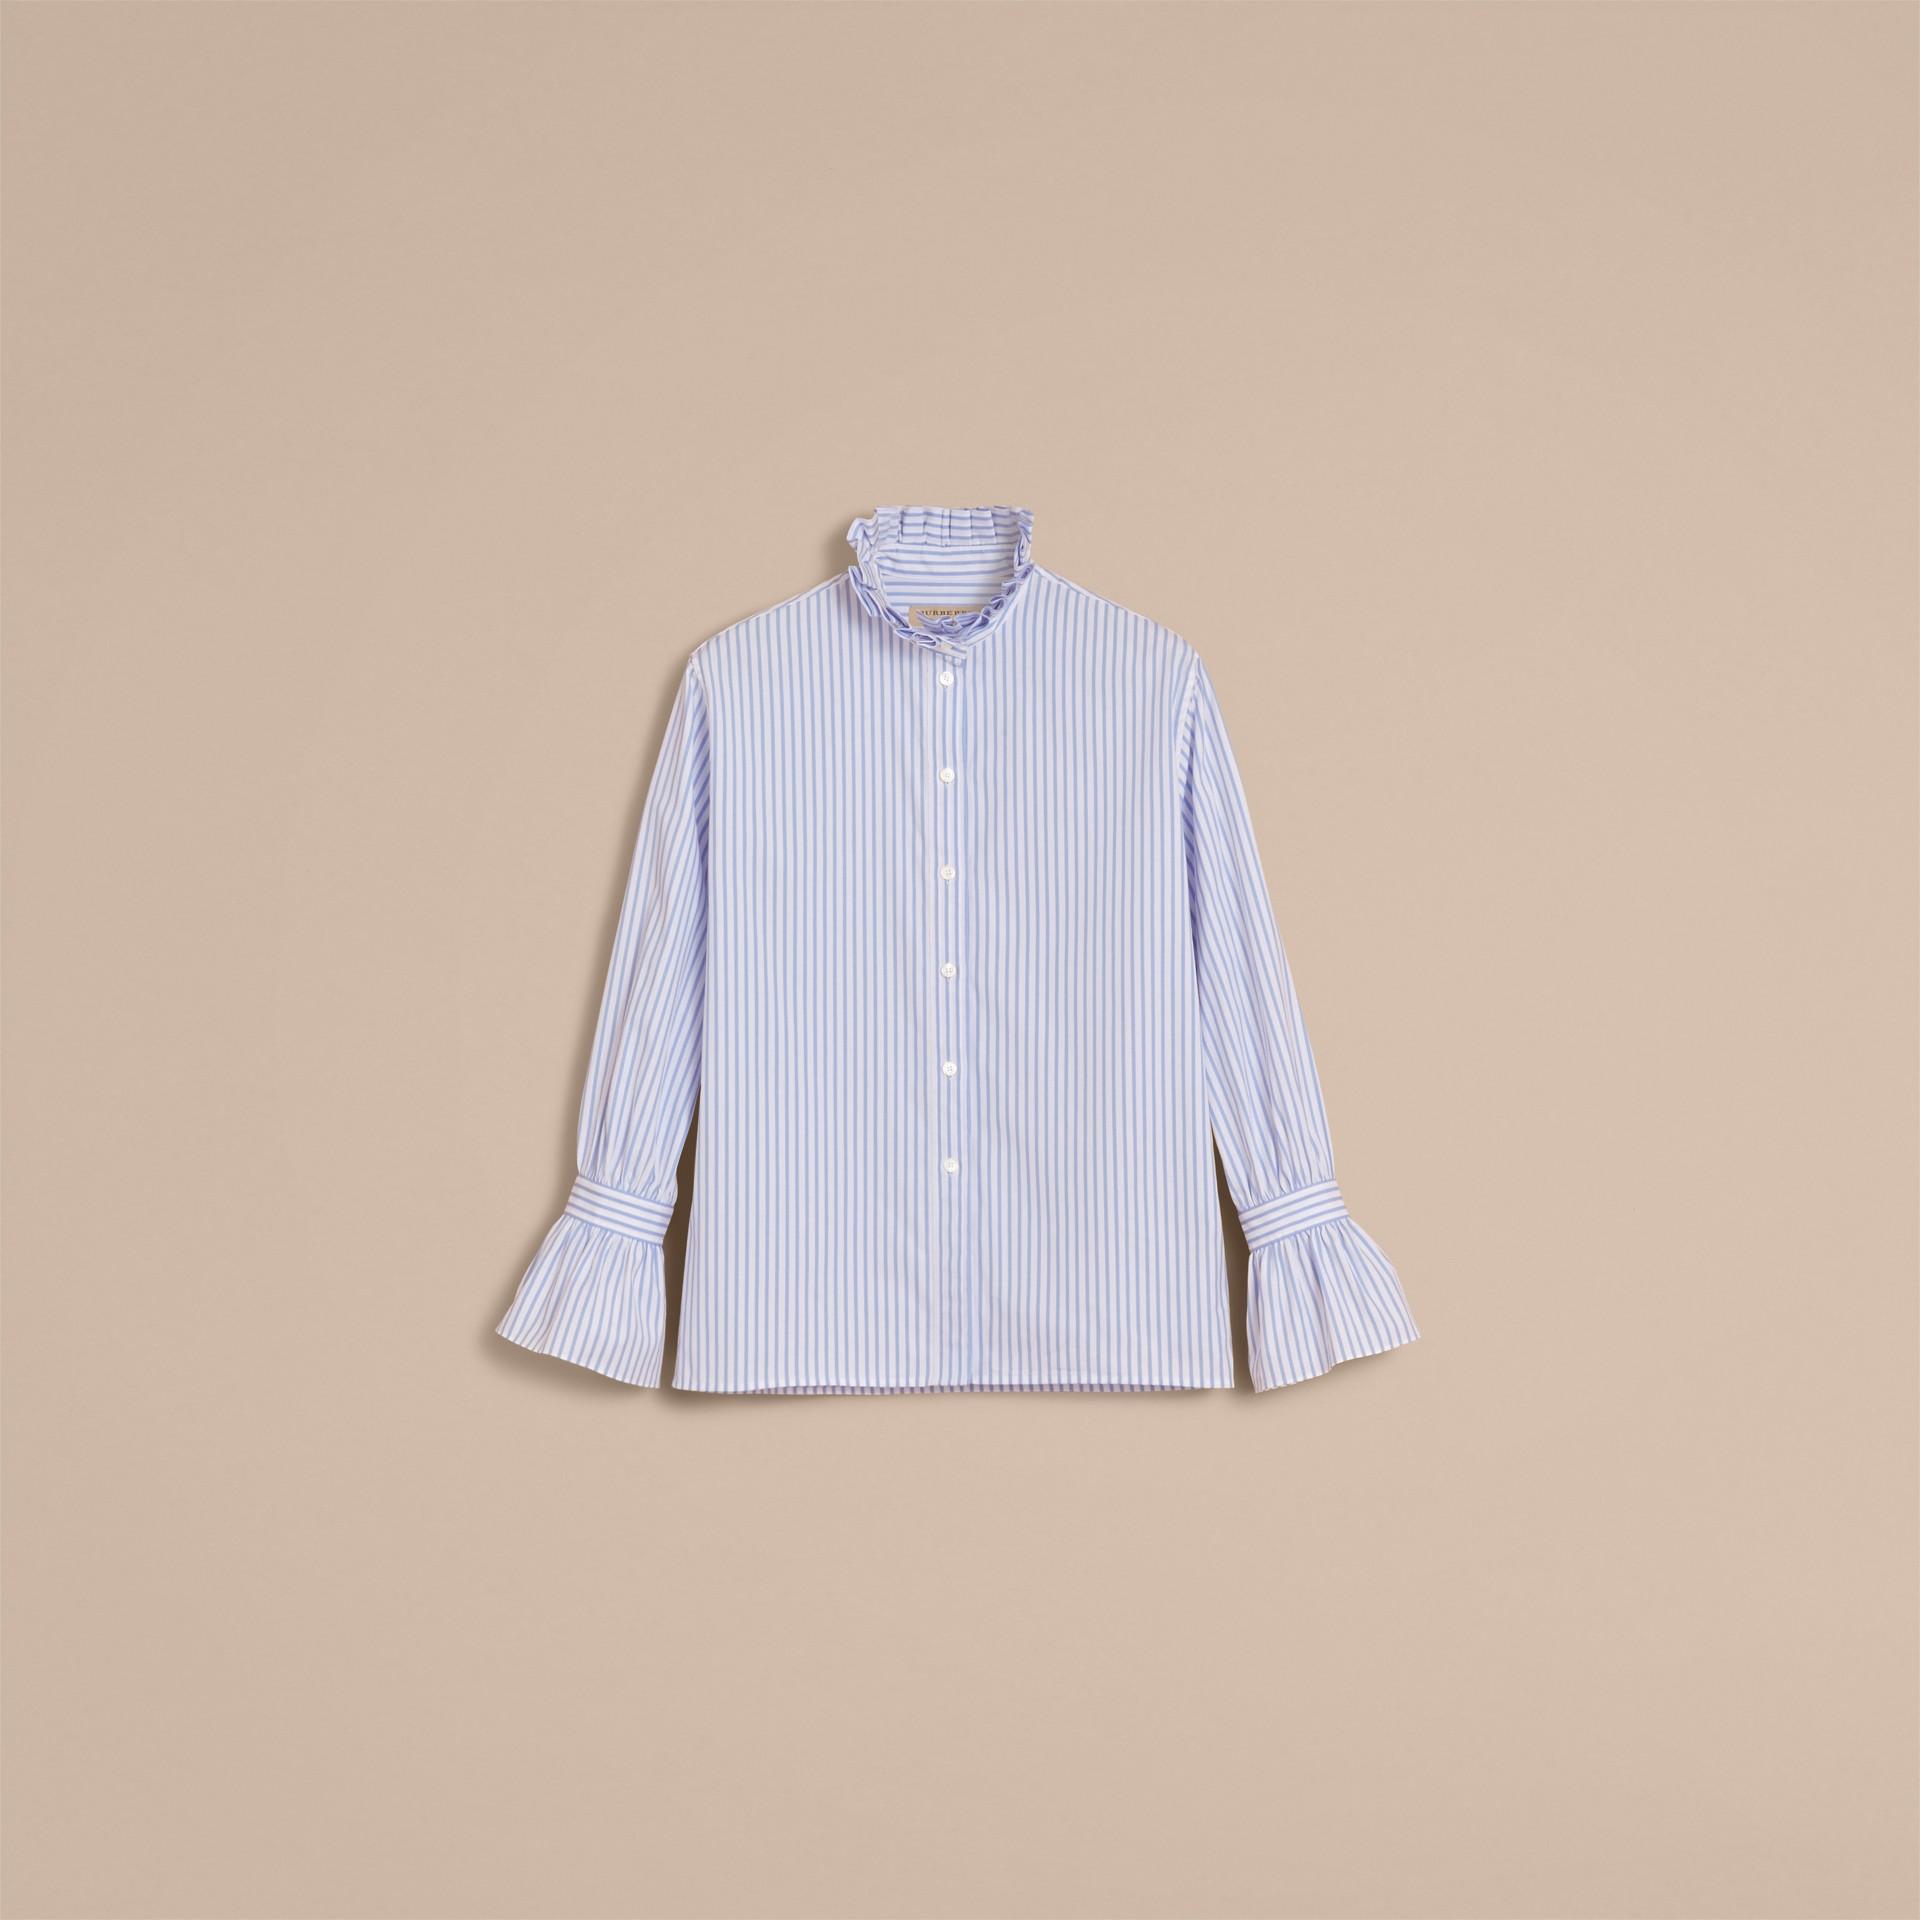 Ruffle Detail Striped Cotton Shirt - gallery image 4